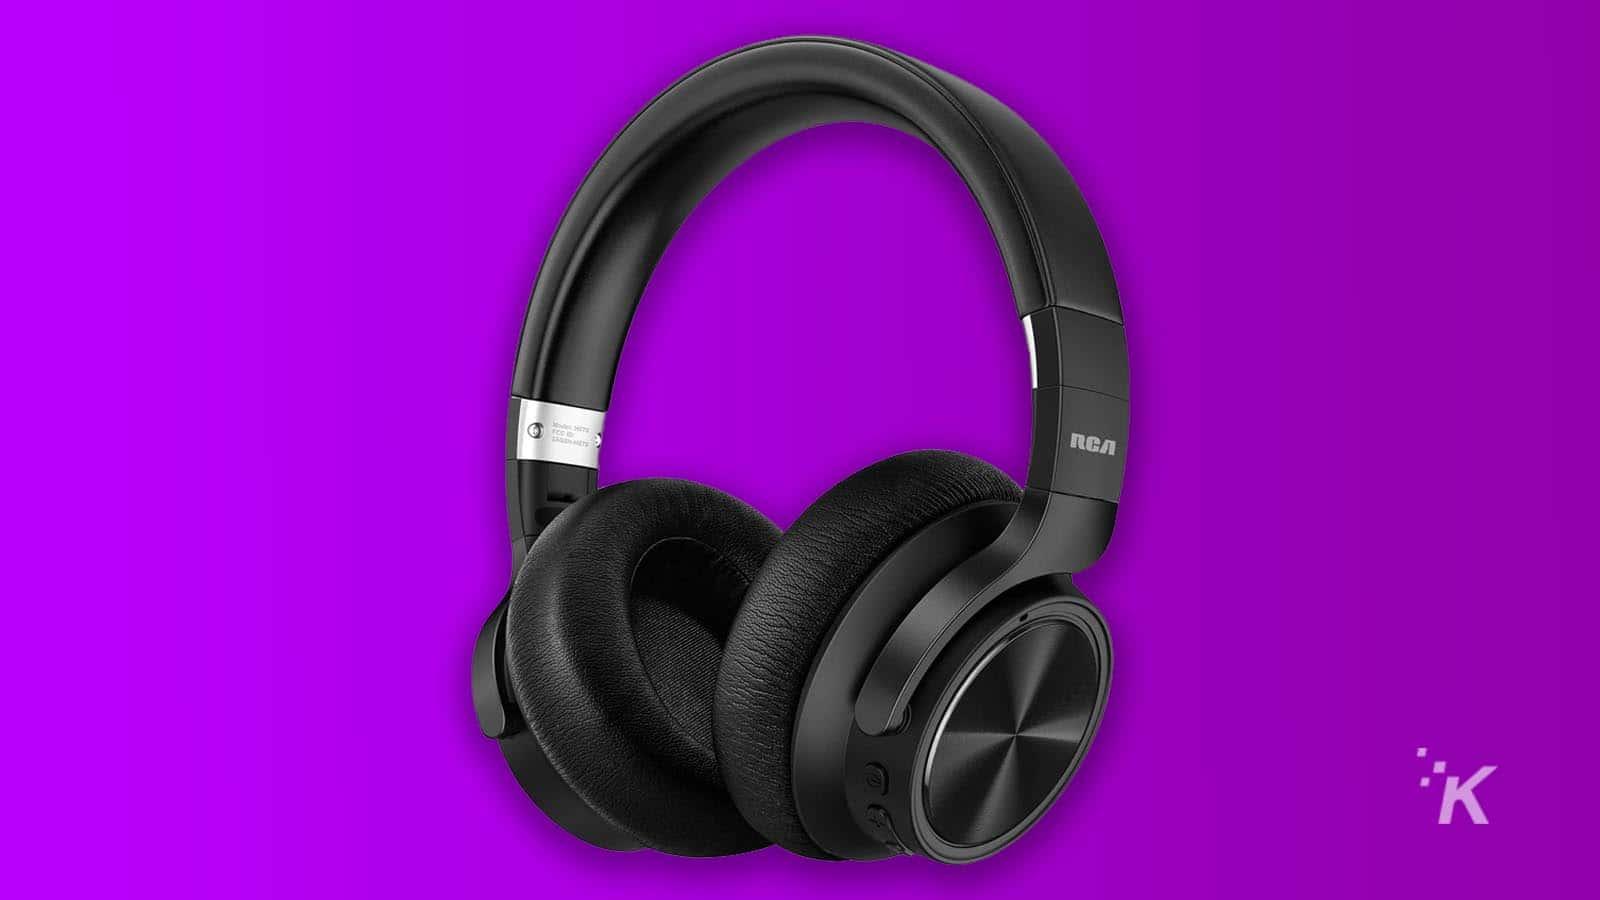 rca noise canceling headphones